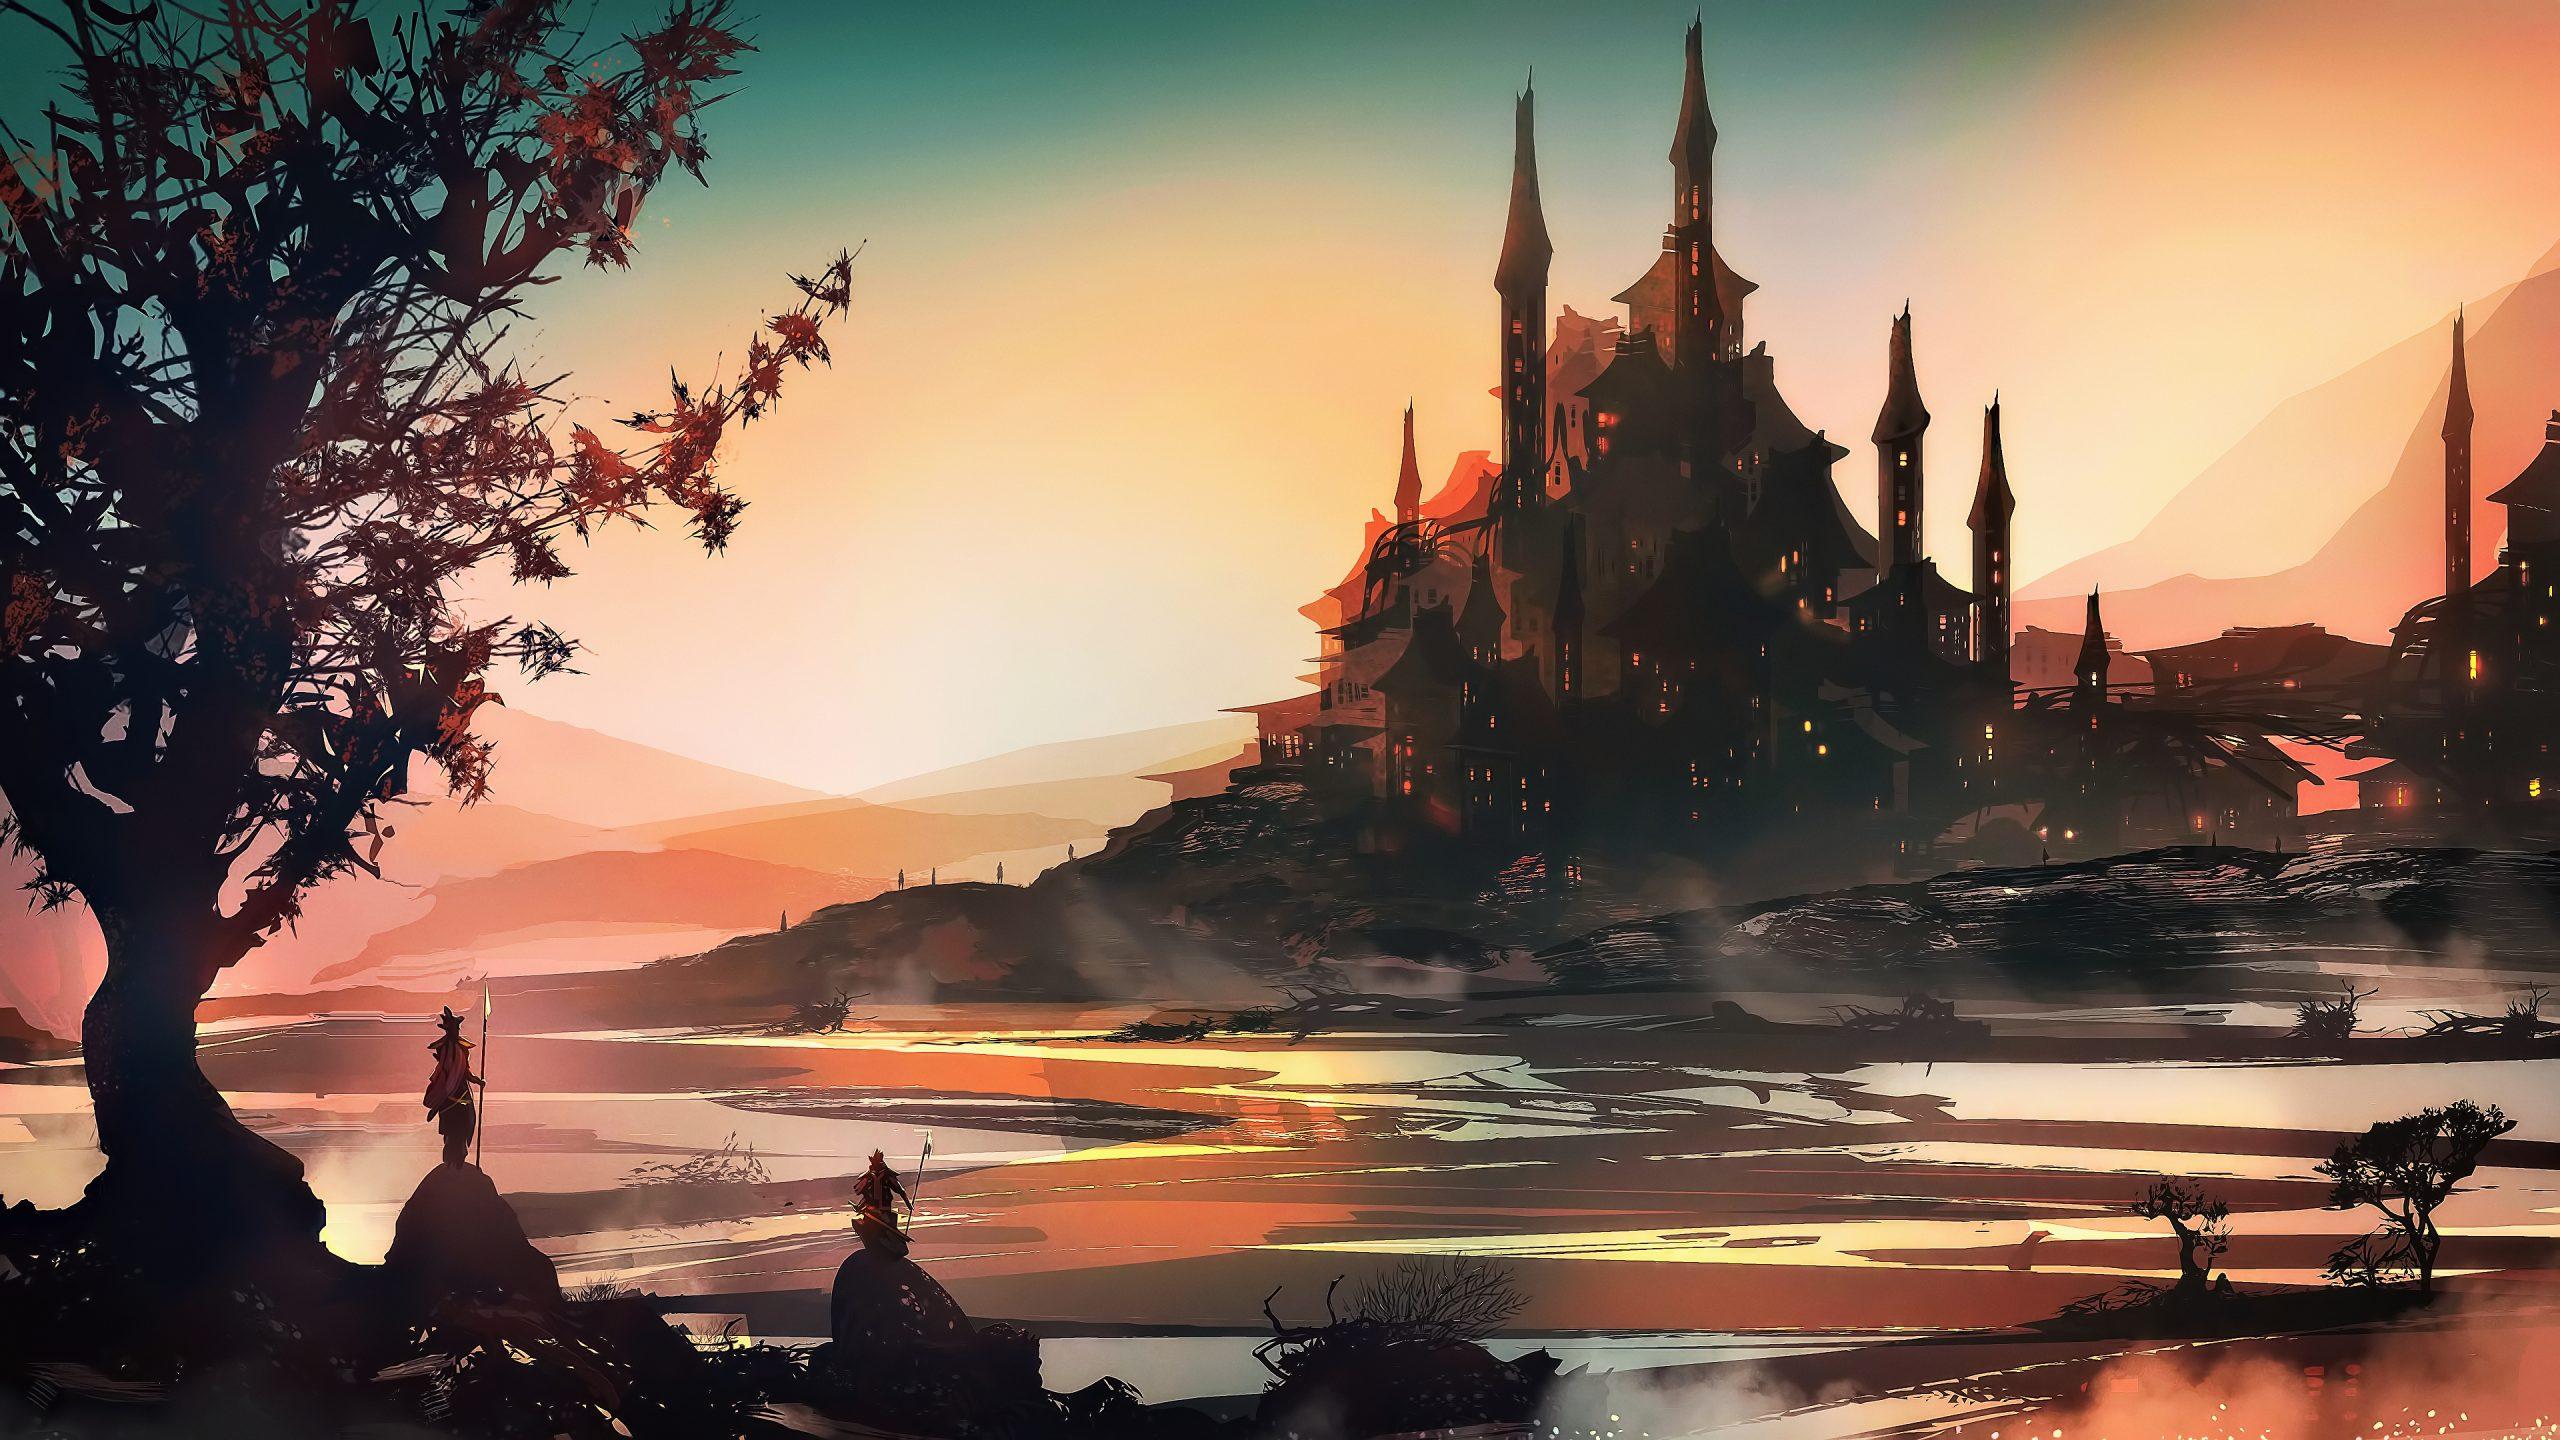 Incubation of fantasy dream